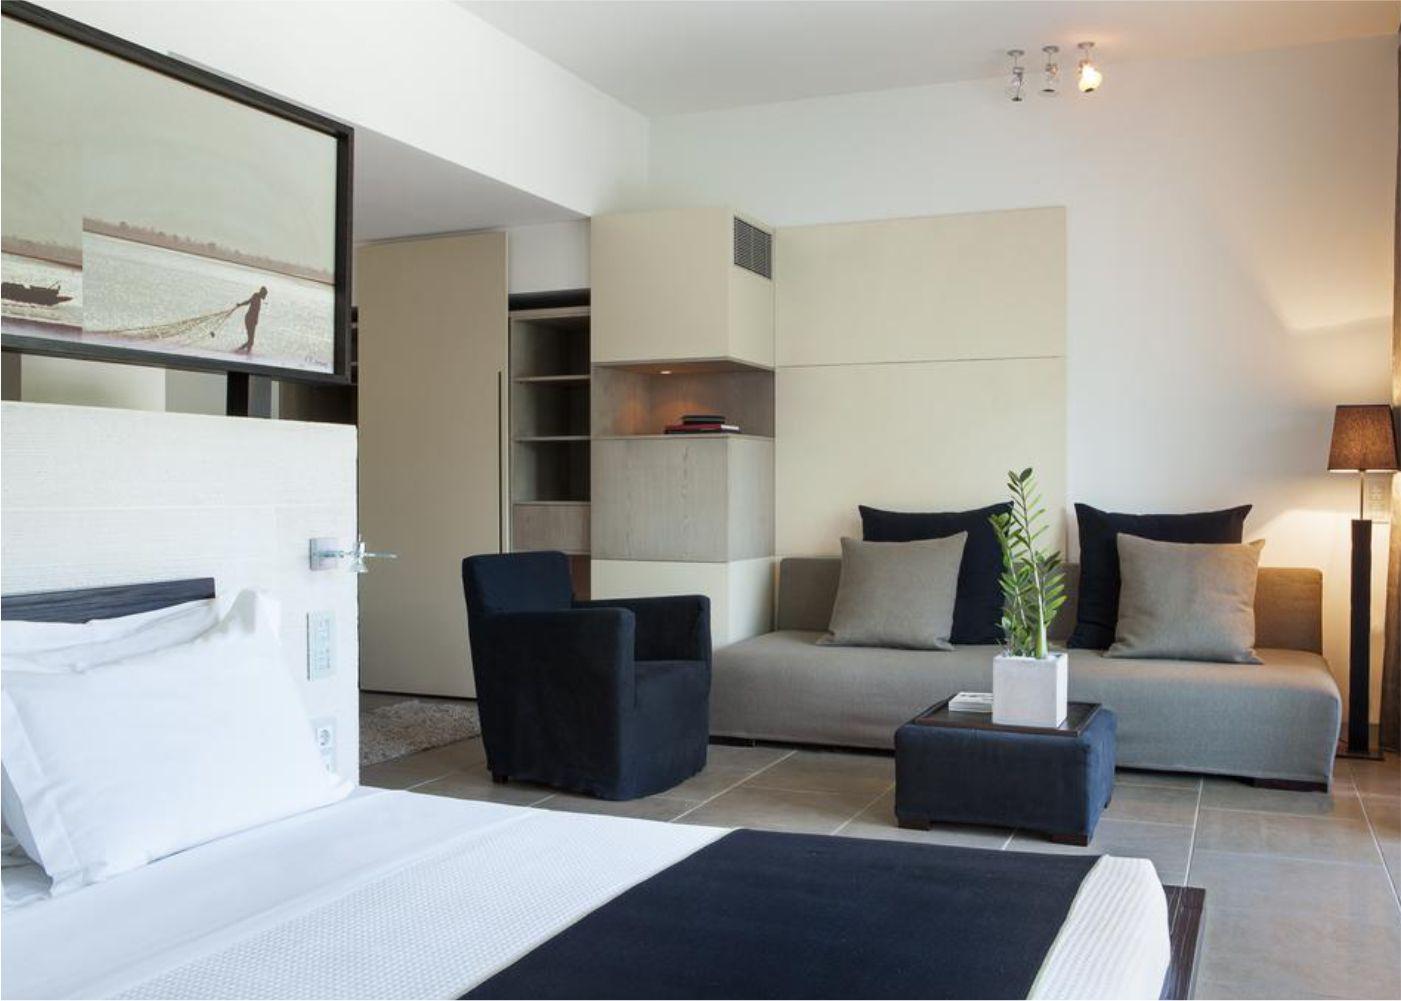 paraskevi-interior-life-gallery-hotel-1